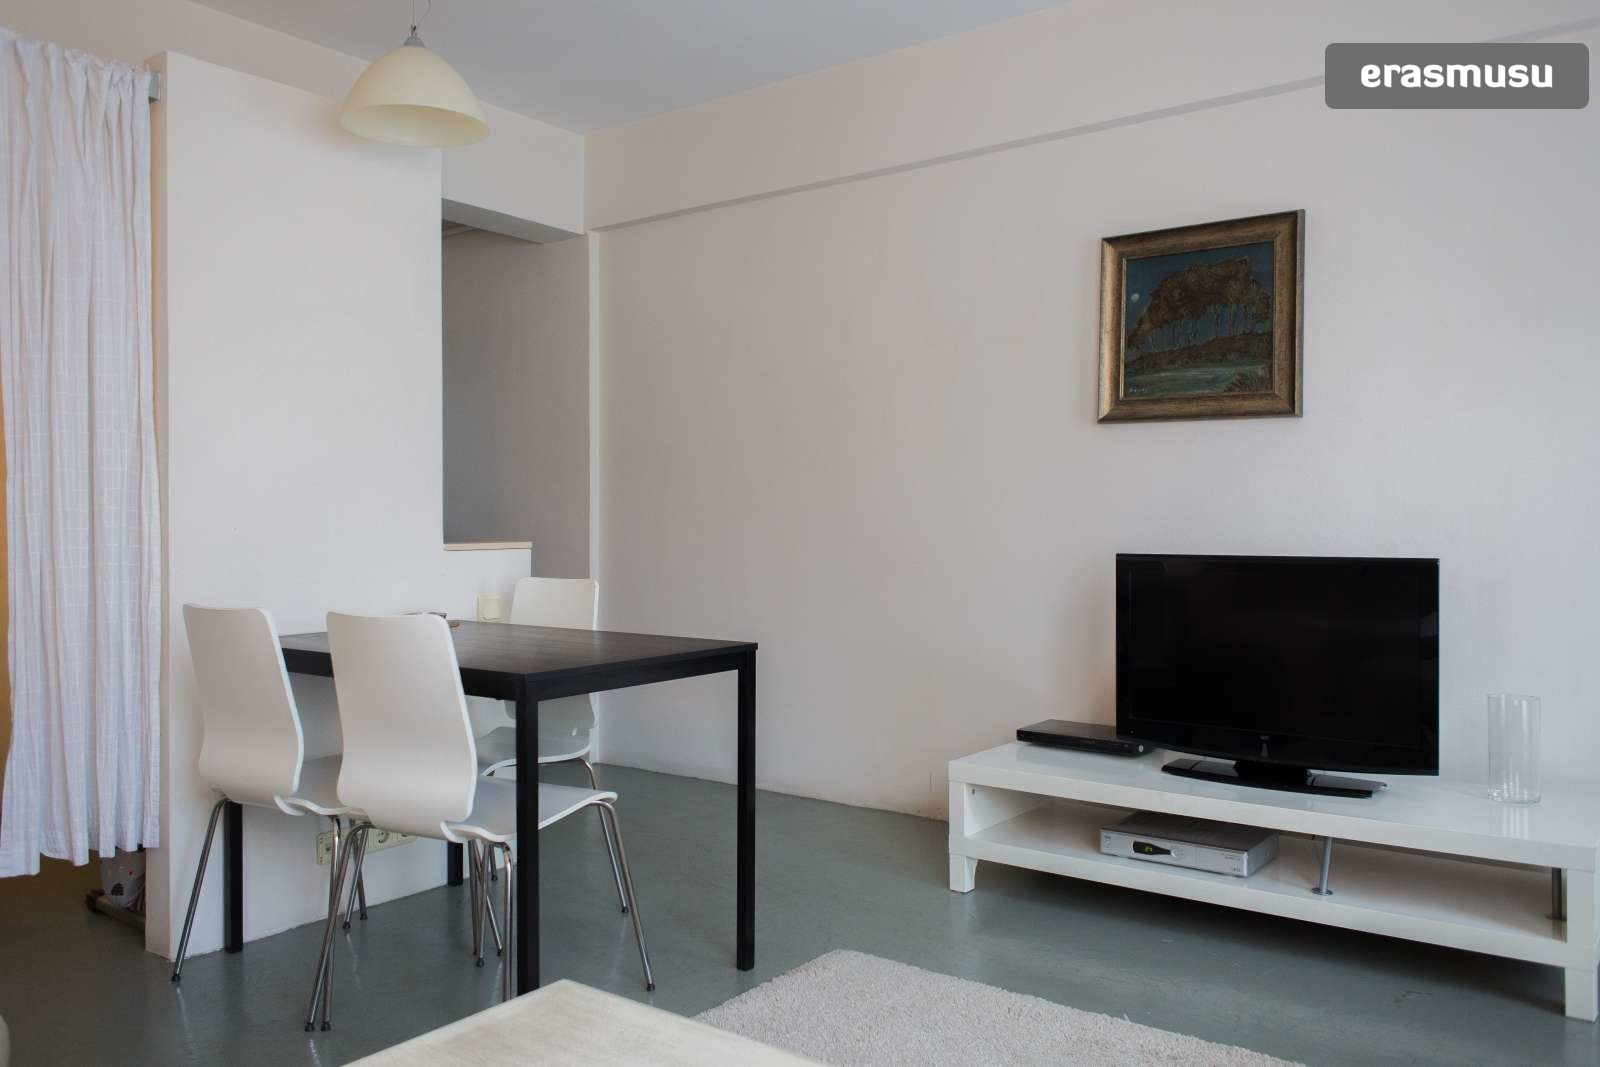 Modern studio apartment for rent in Sisli, Istanbul